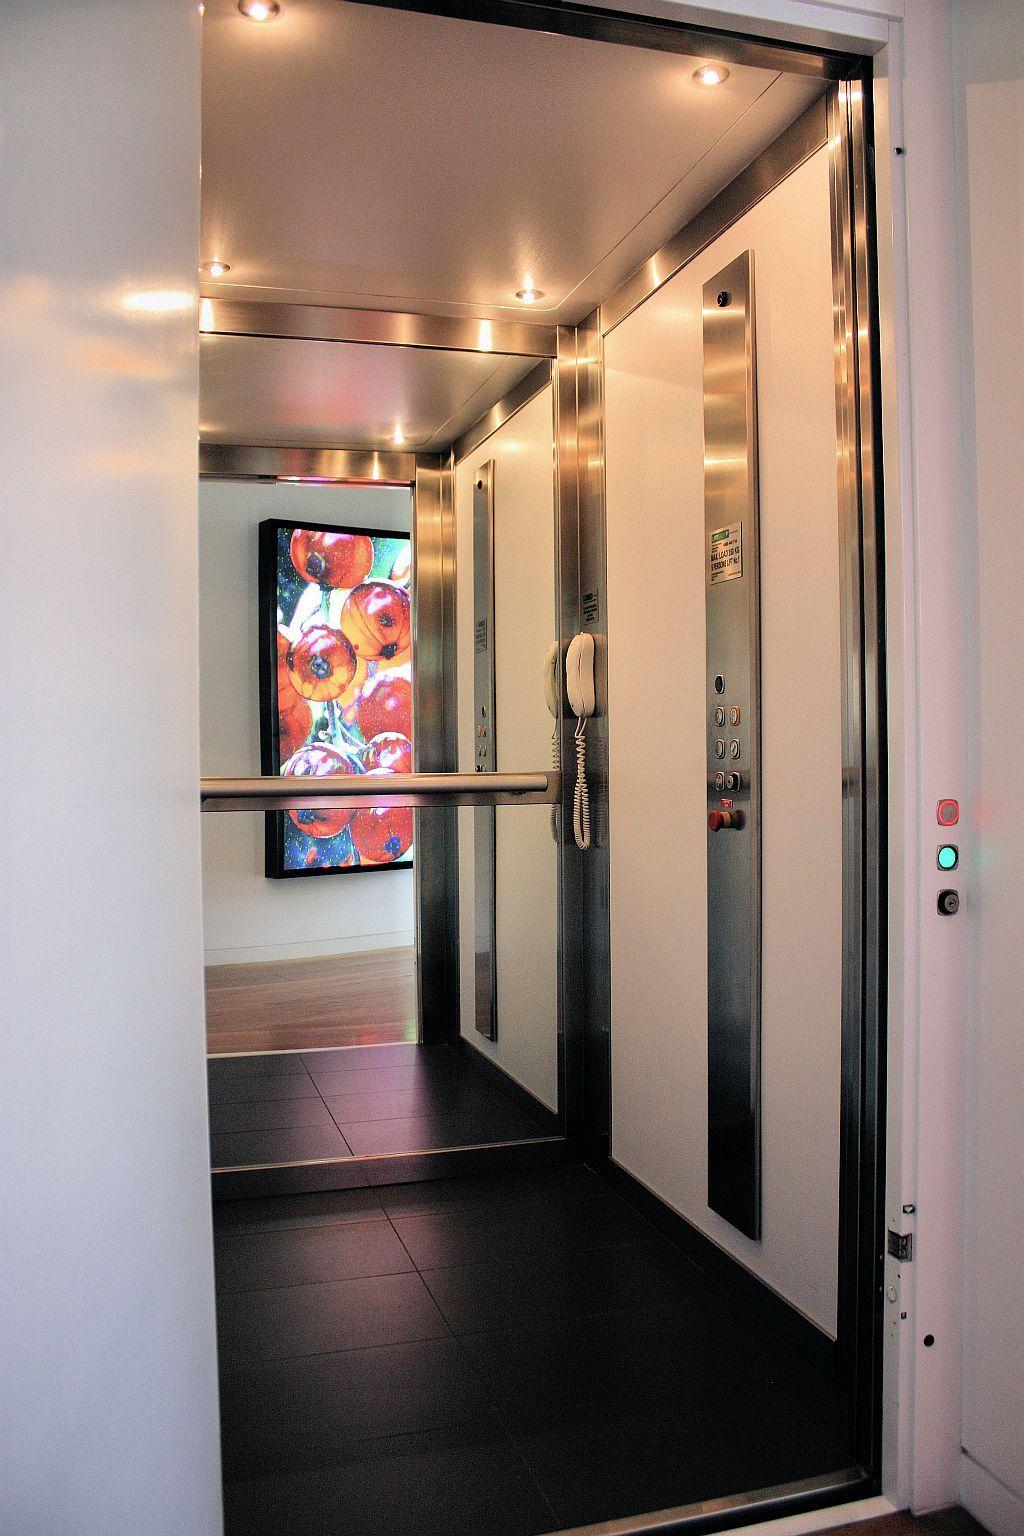 Elfolift Home Elevator Interiors Gallery Luxury Home Elevators